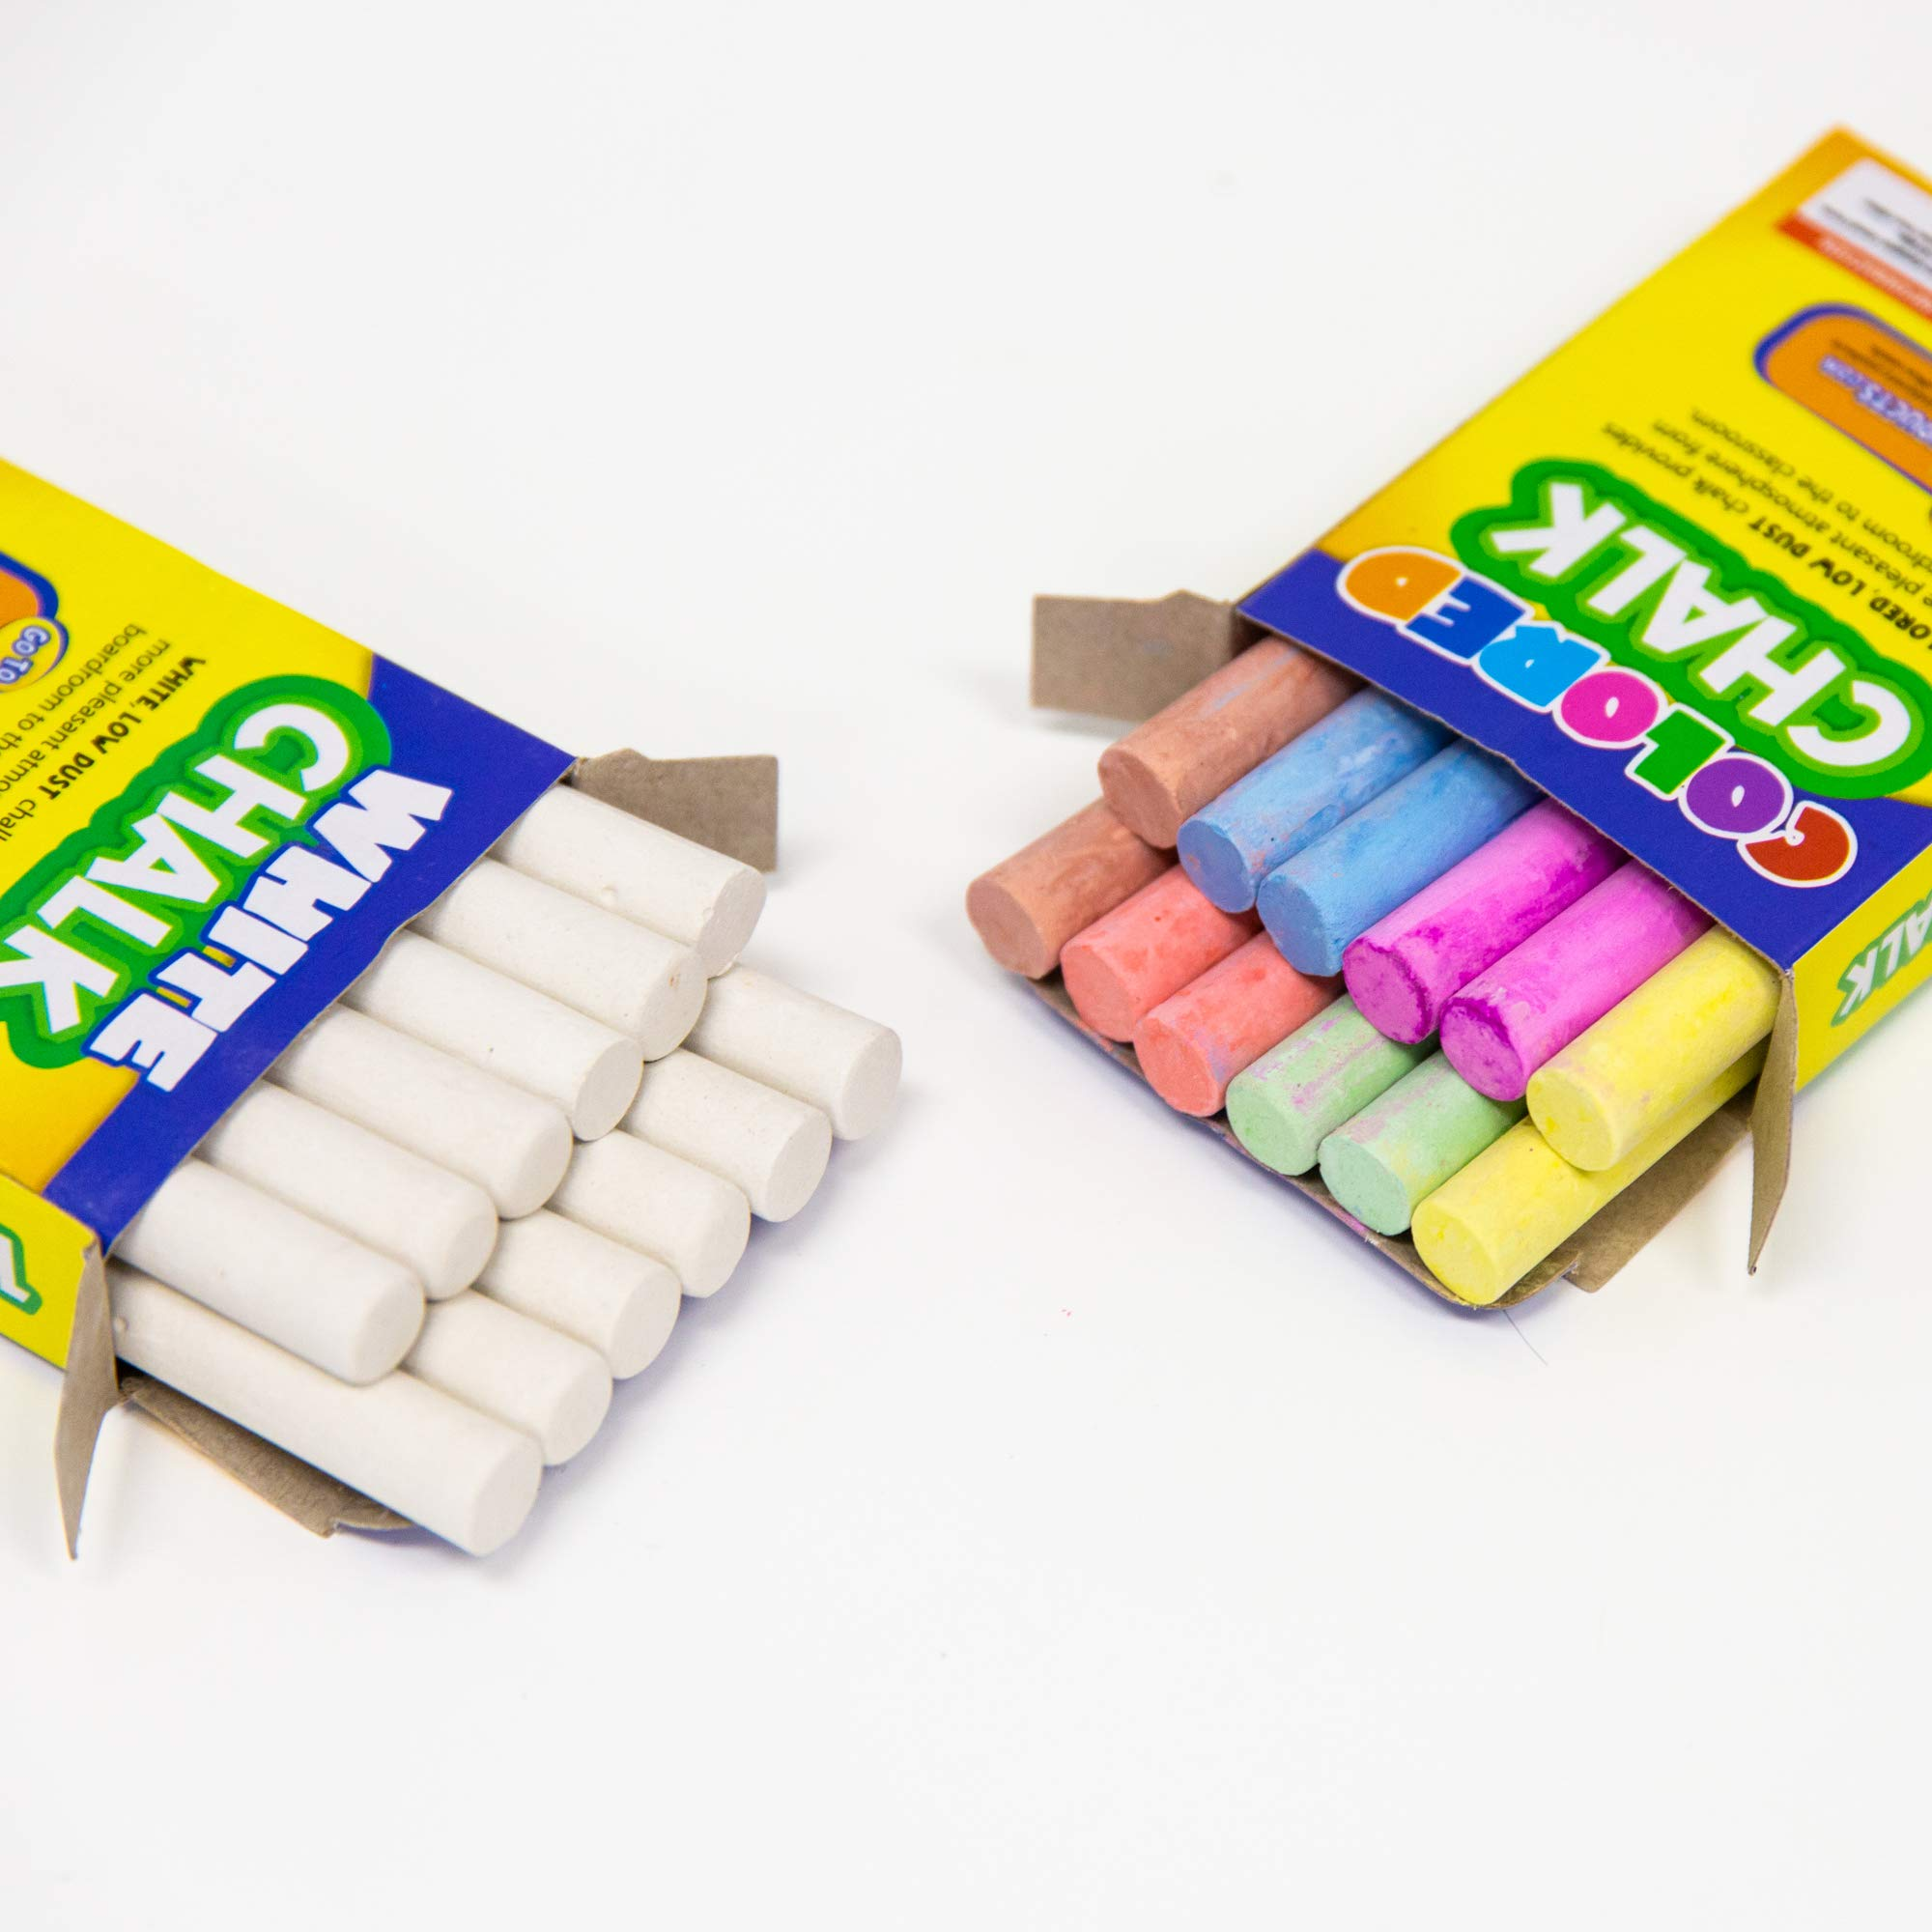 BAZIC 6 Color & White Chalk w/Eraser Set, Blackboard Chalkboard Chalks, Great Game Activity for Kids, Art Teacher Office Classroom Store Home